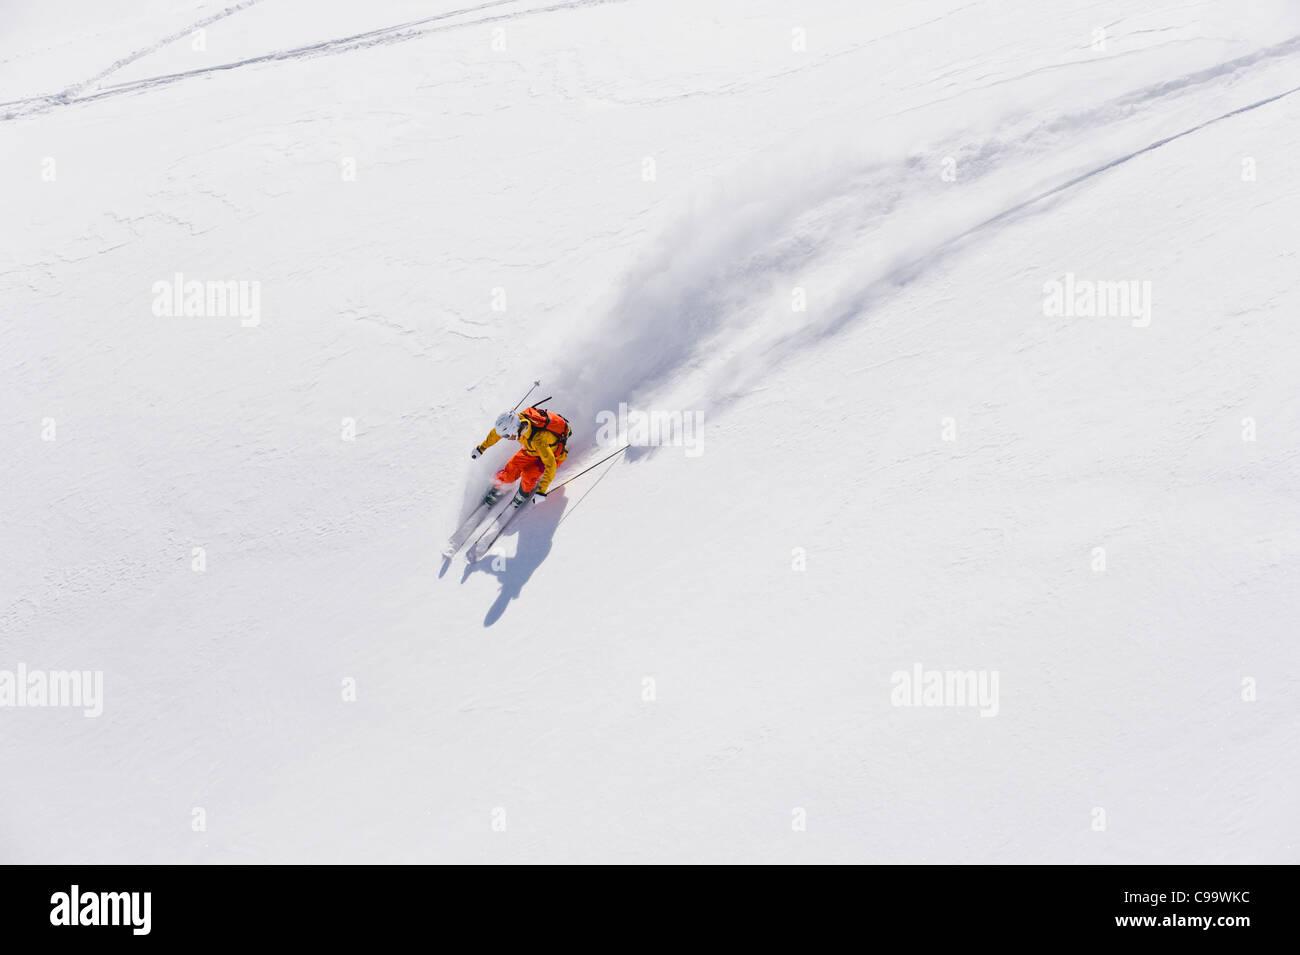 Austria, Young woman doing alpine skiing - Stock Image